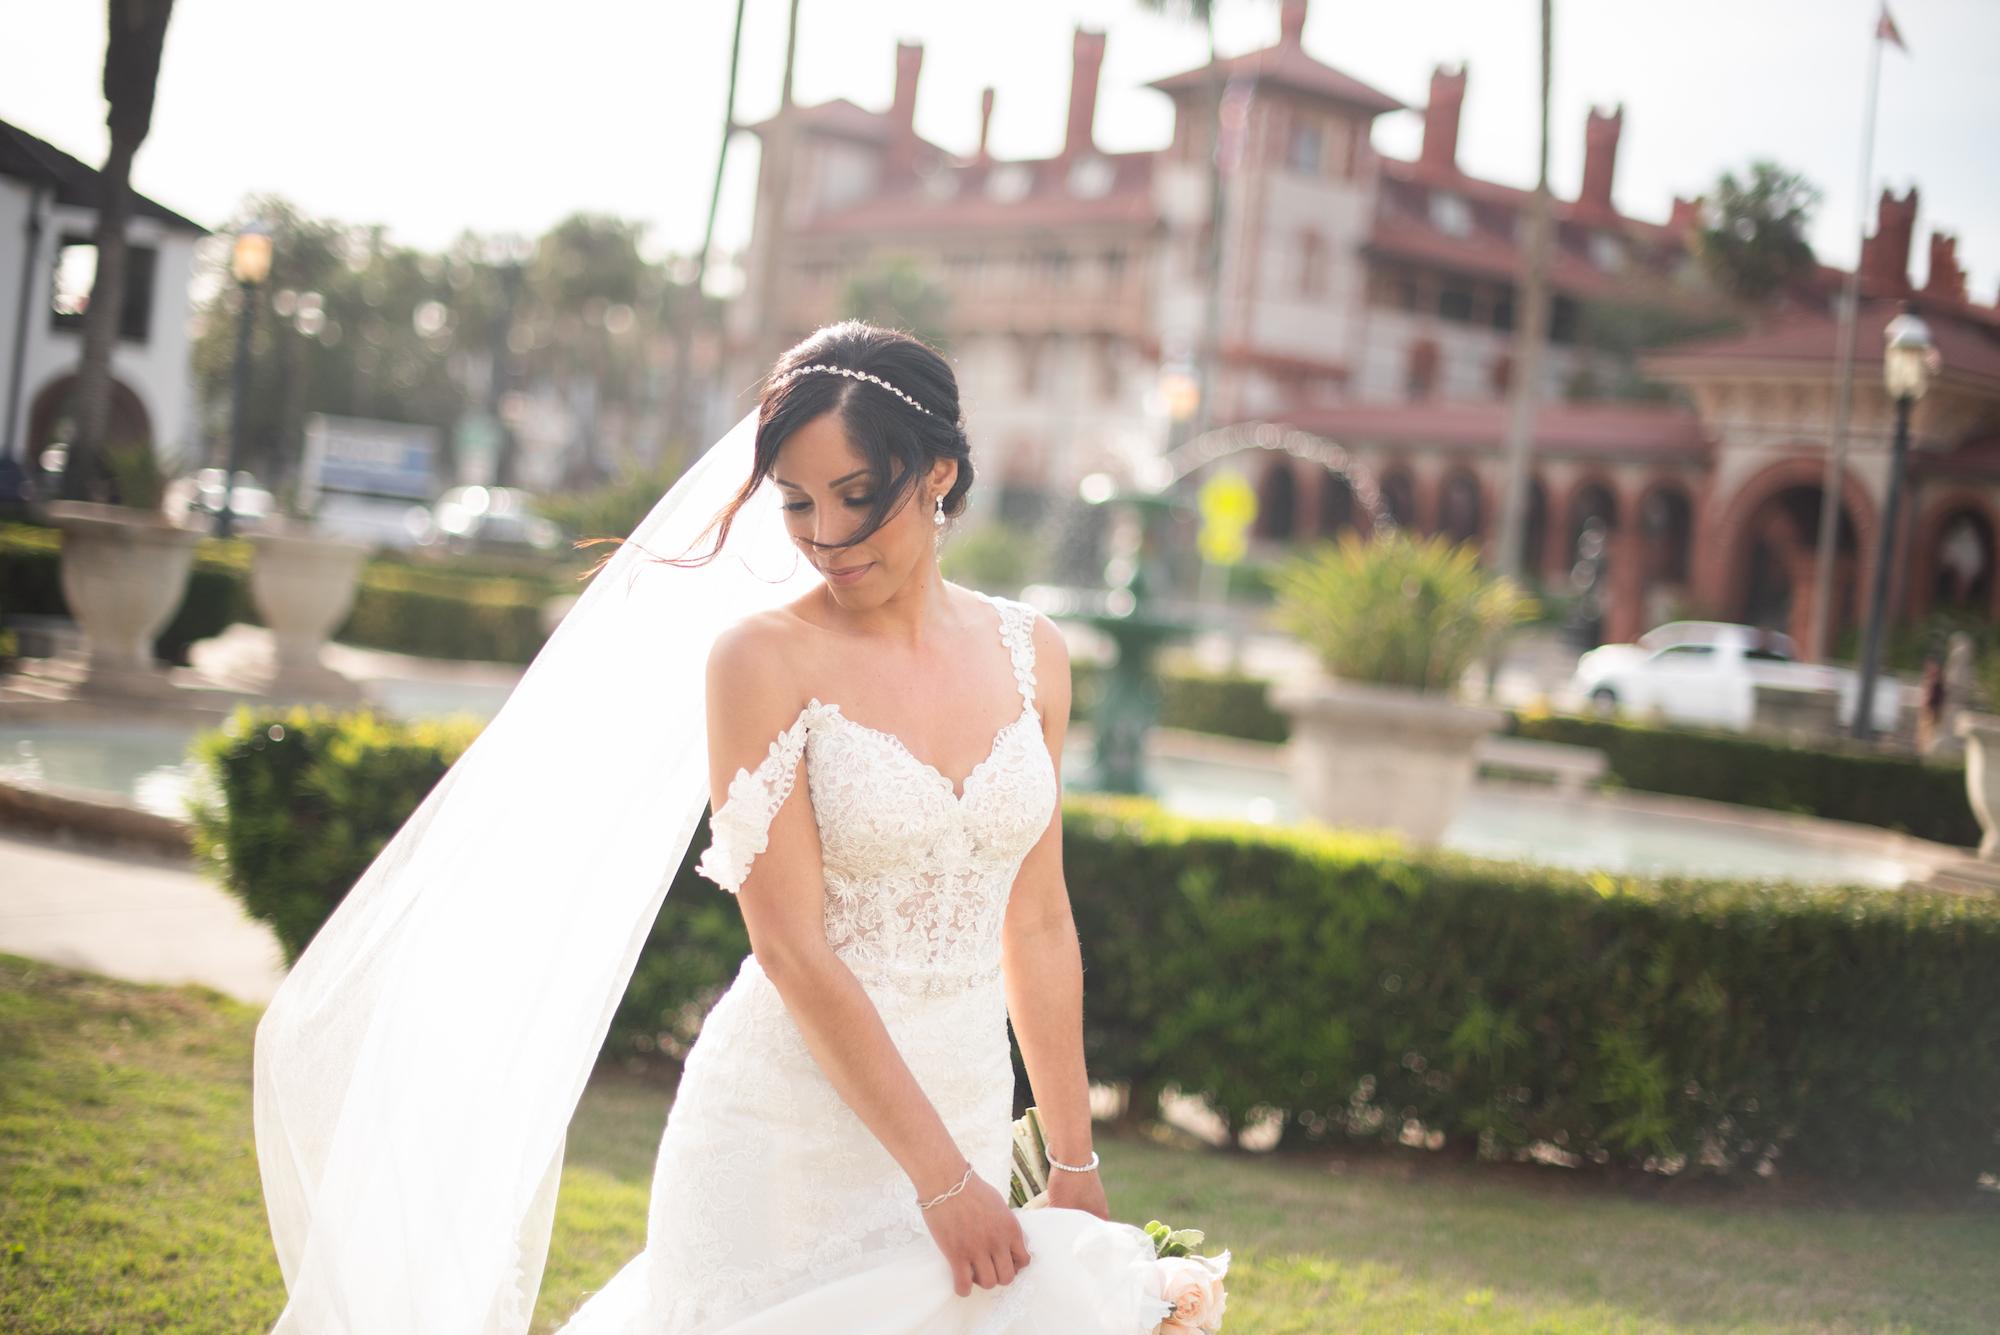 st-augustine-photographers-st-augustine-wedding-photographer-sarah-annay15.jpg